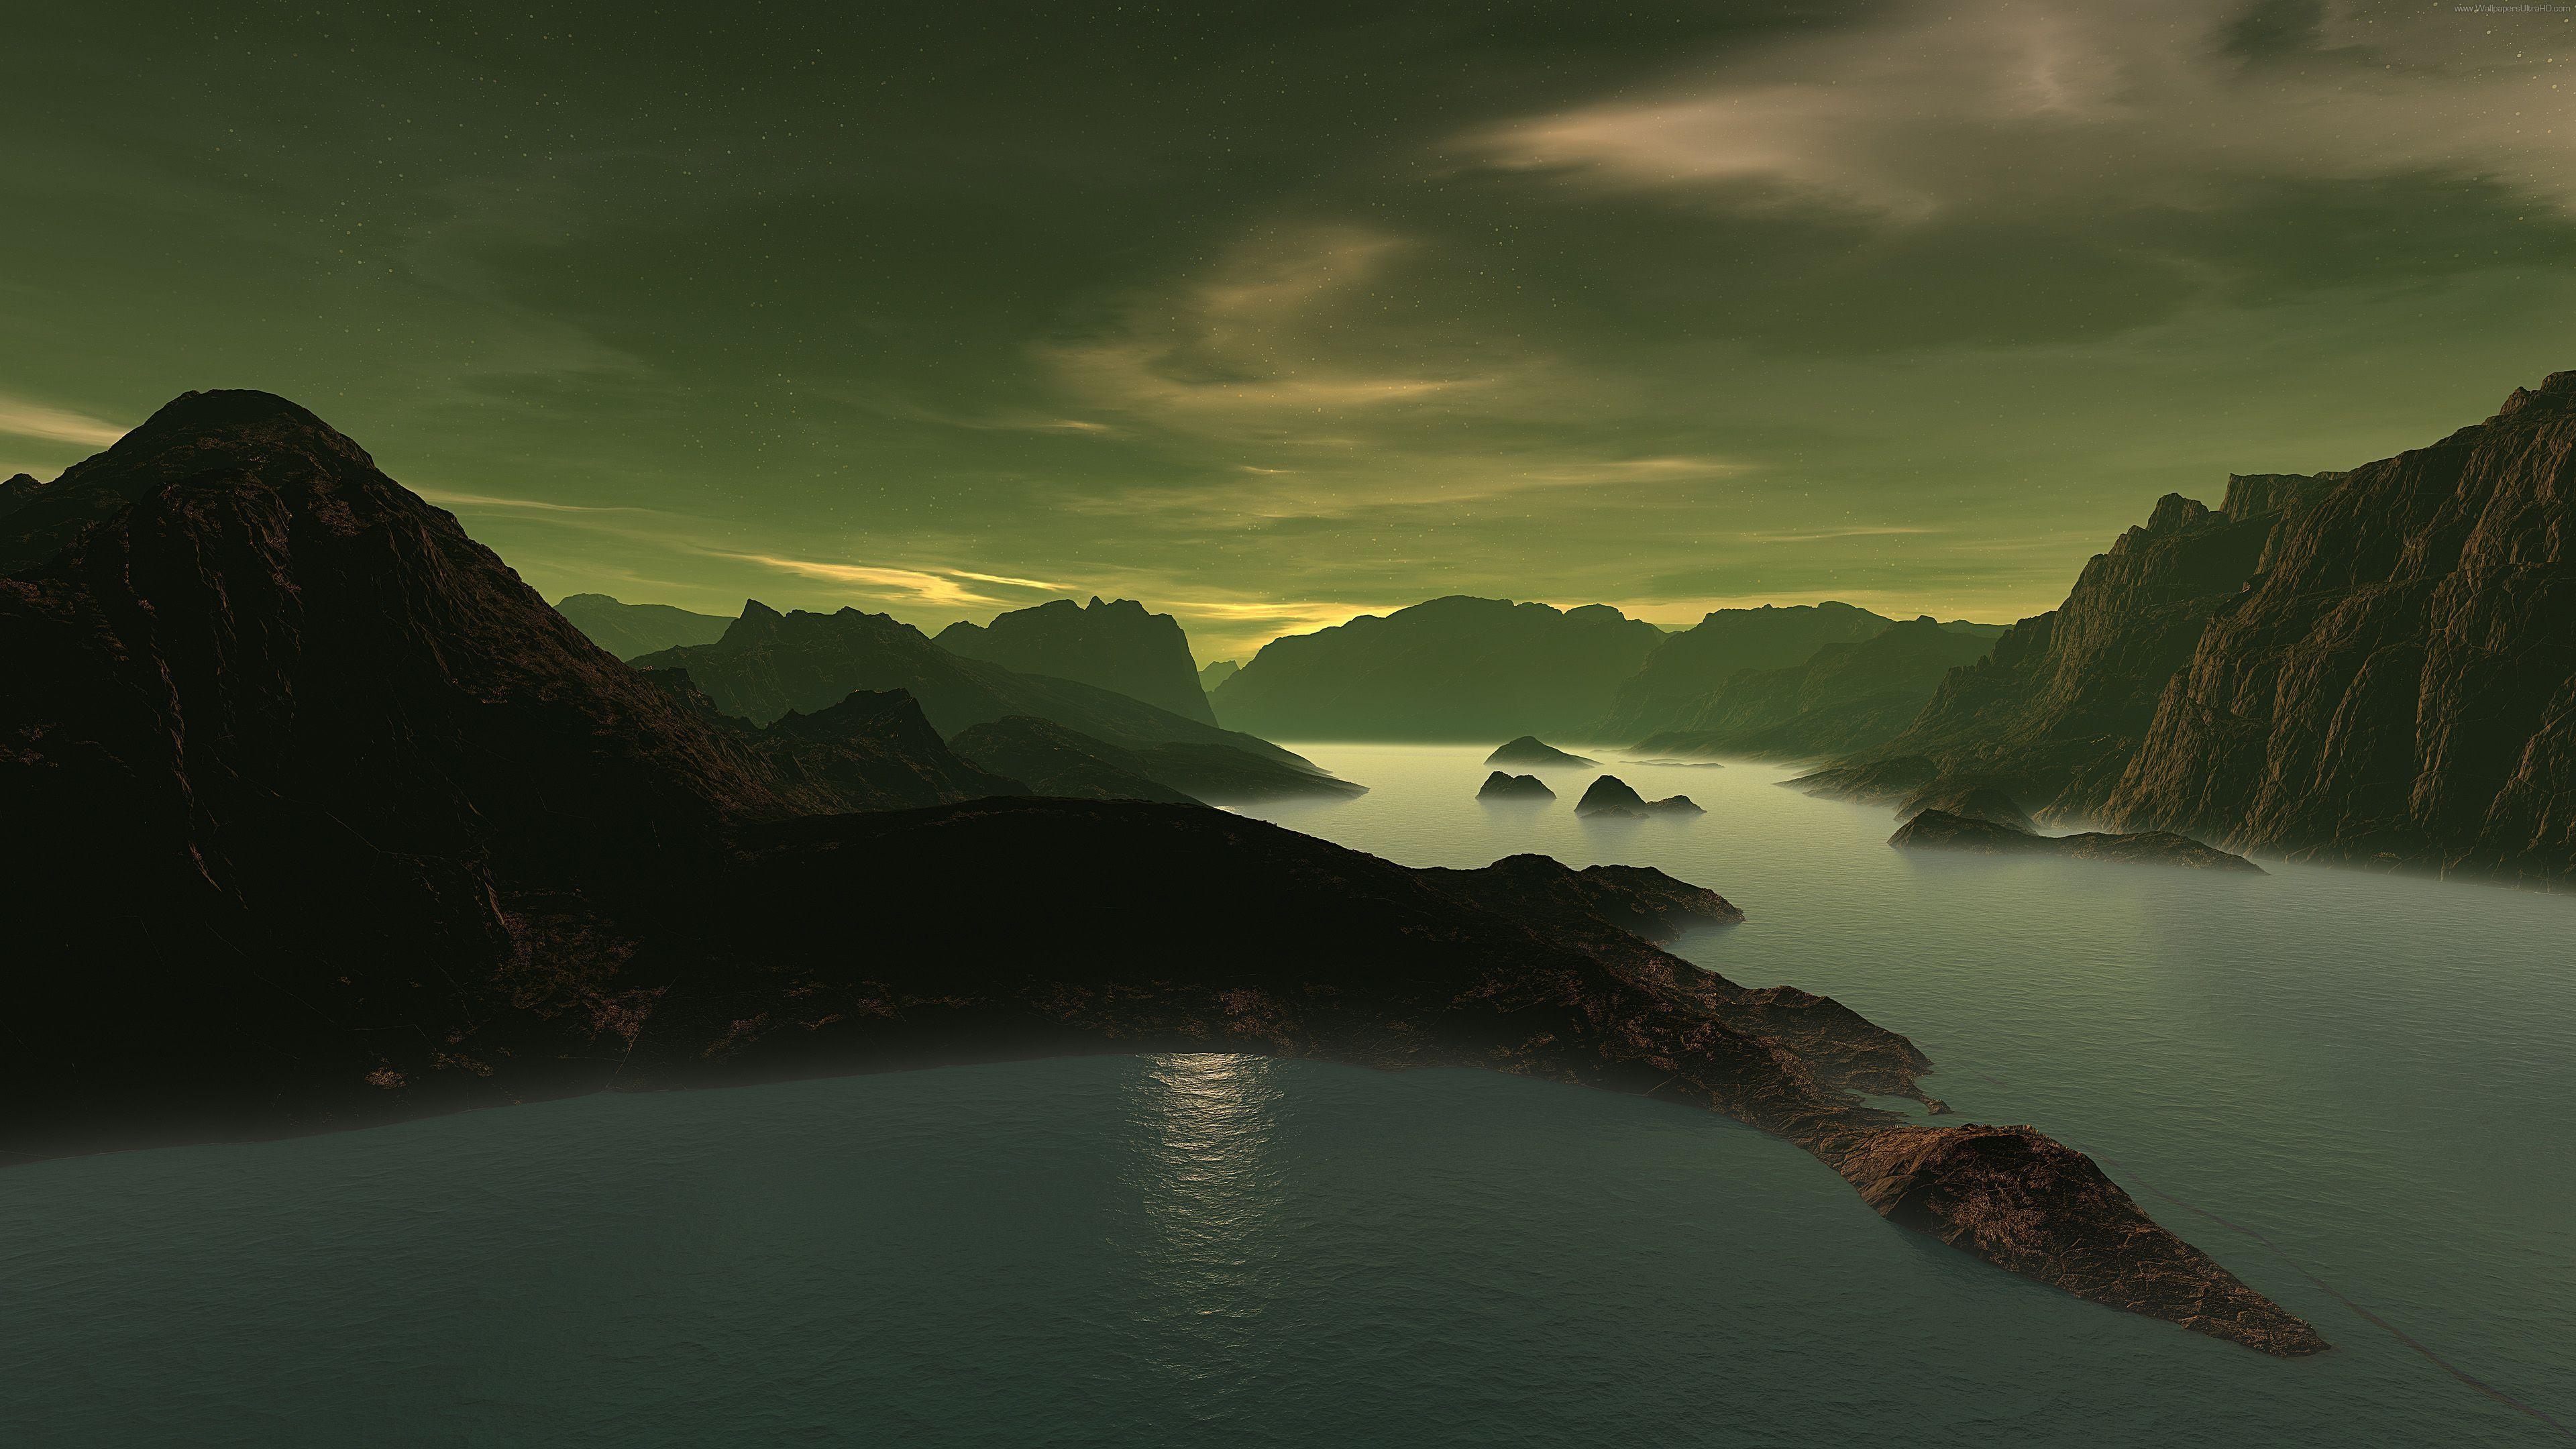 Tranquillity Tranquility Calmness Hd Landscape Dark Landscape Hd Nature Wallpapers